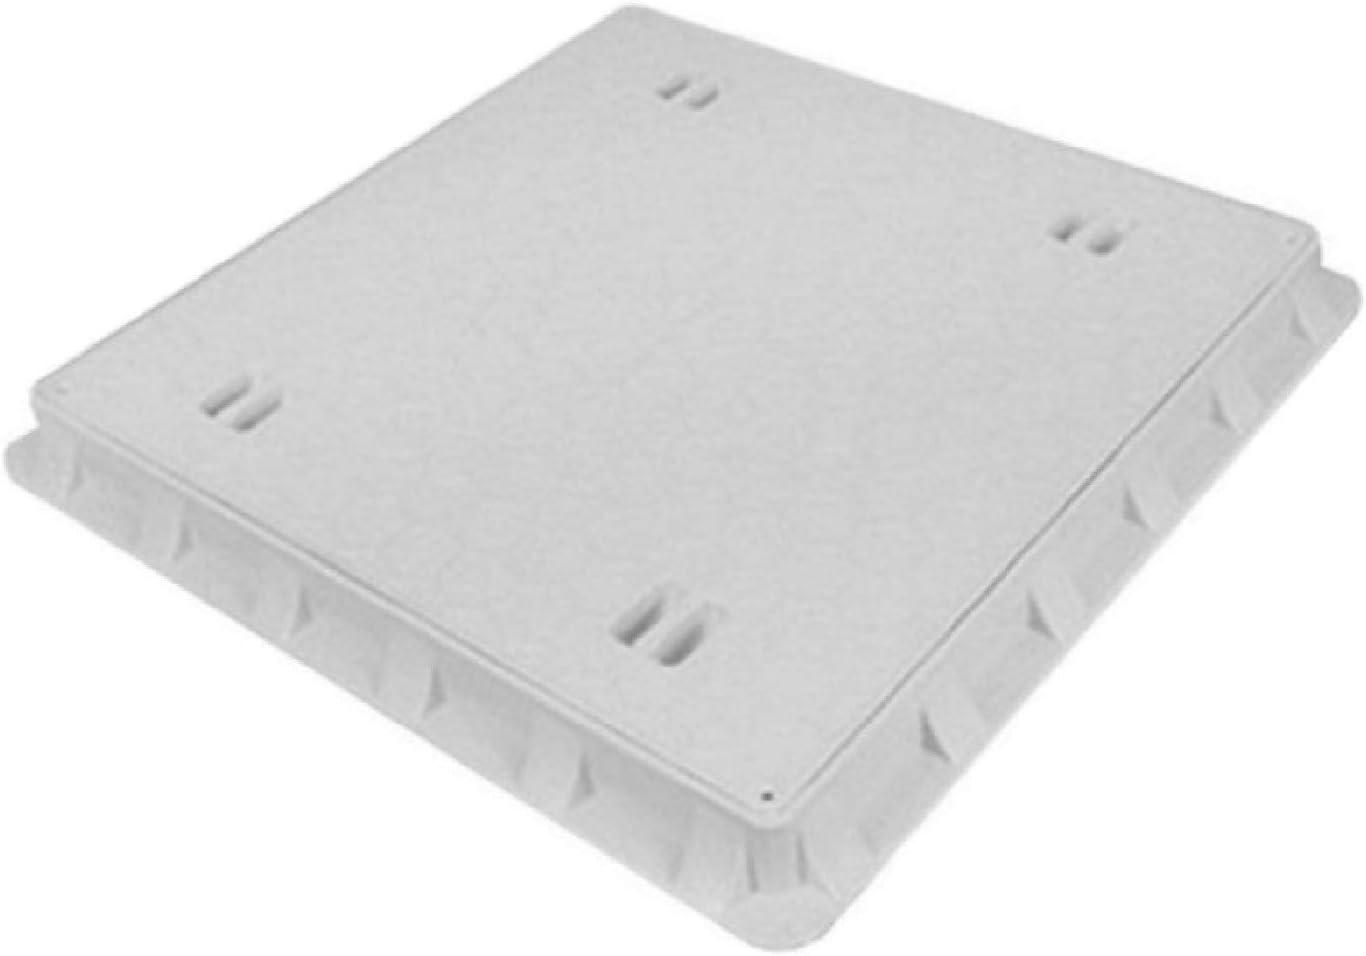 20x20cm Tapa Para Arqueta Desagüe Cubierta Adequa Cisterna Tapas Arquetas Tapadera plastico composite PP